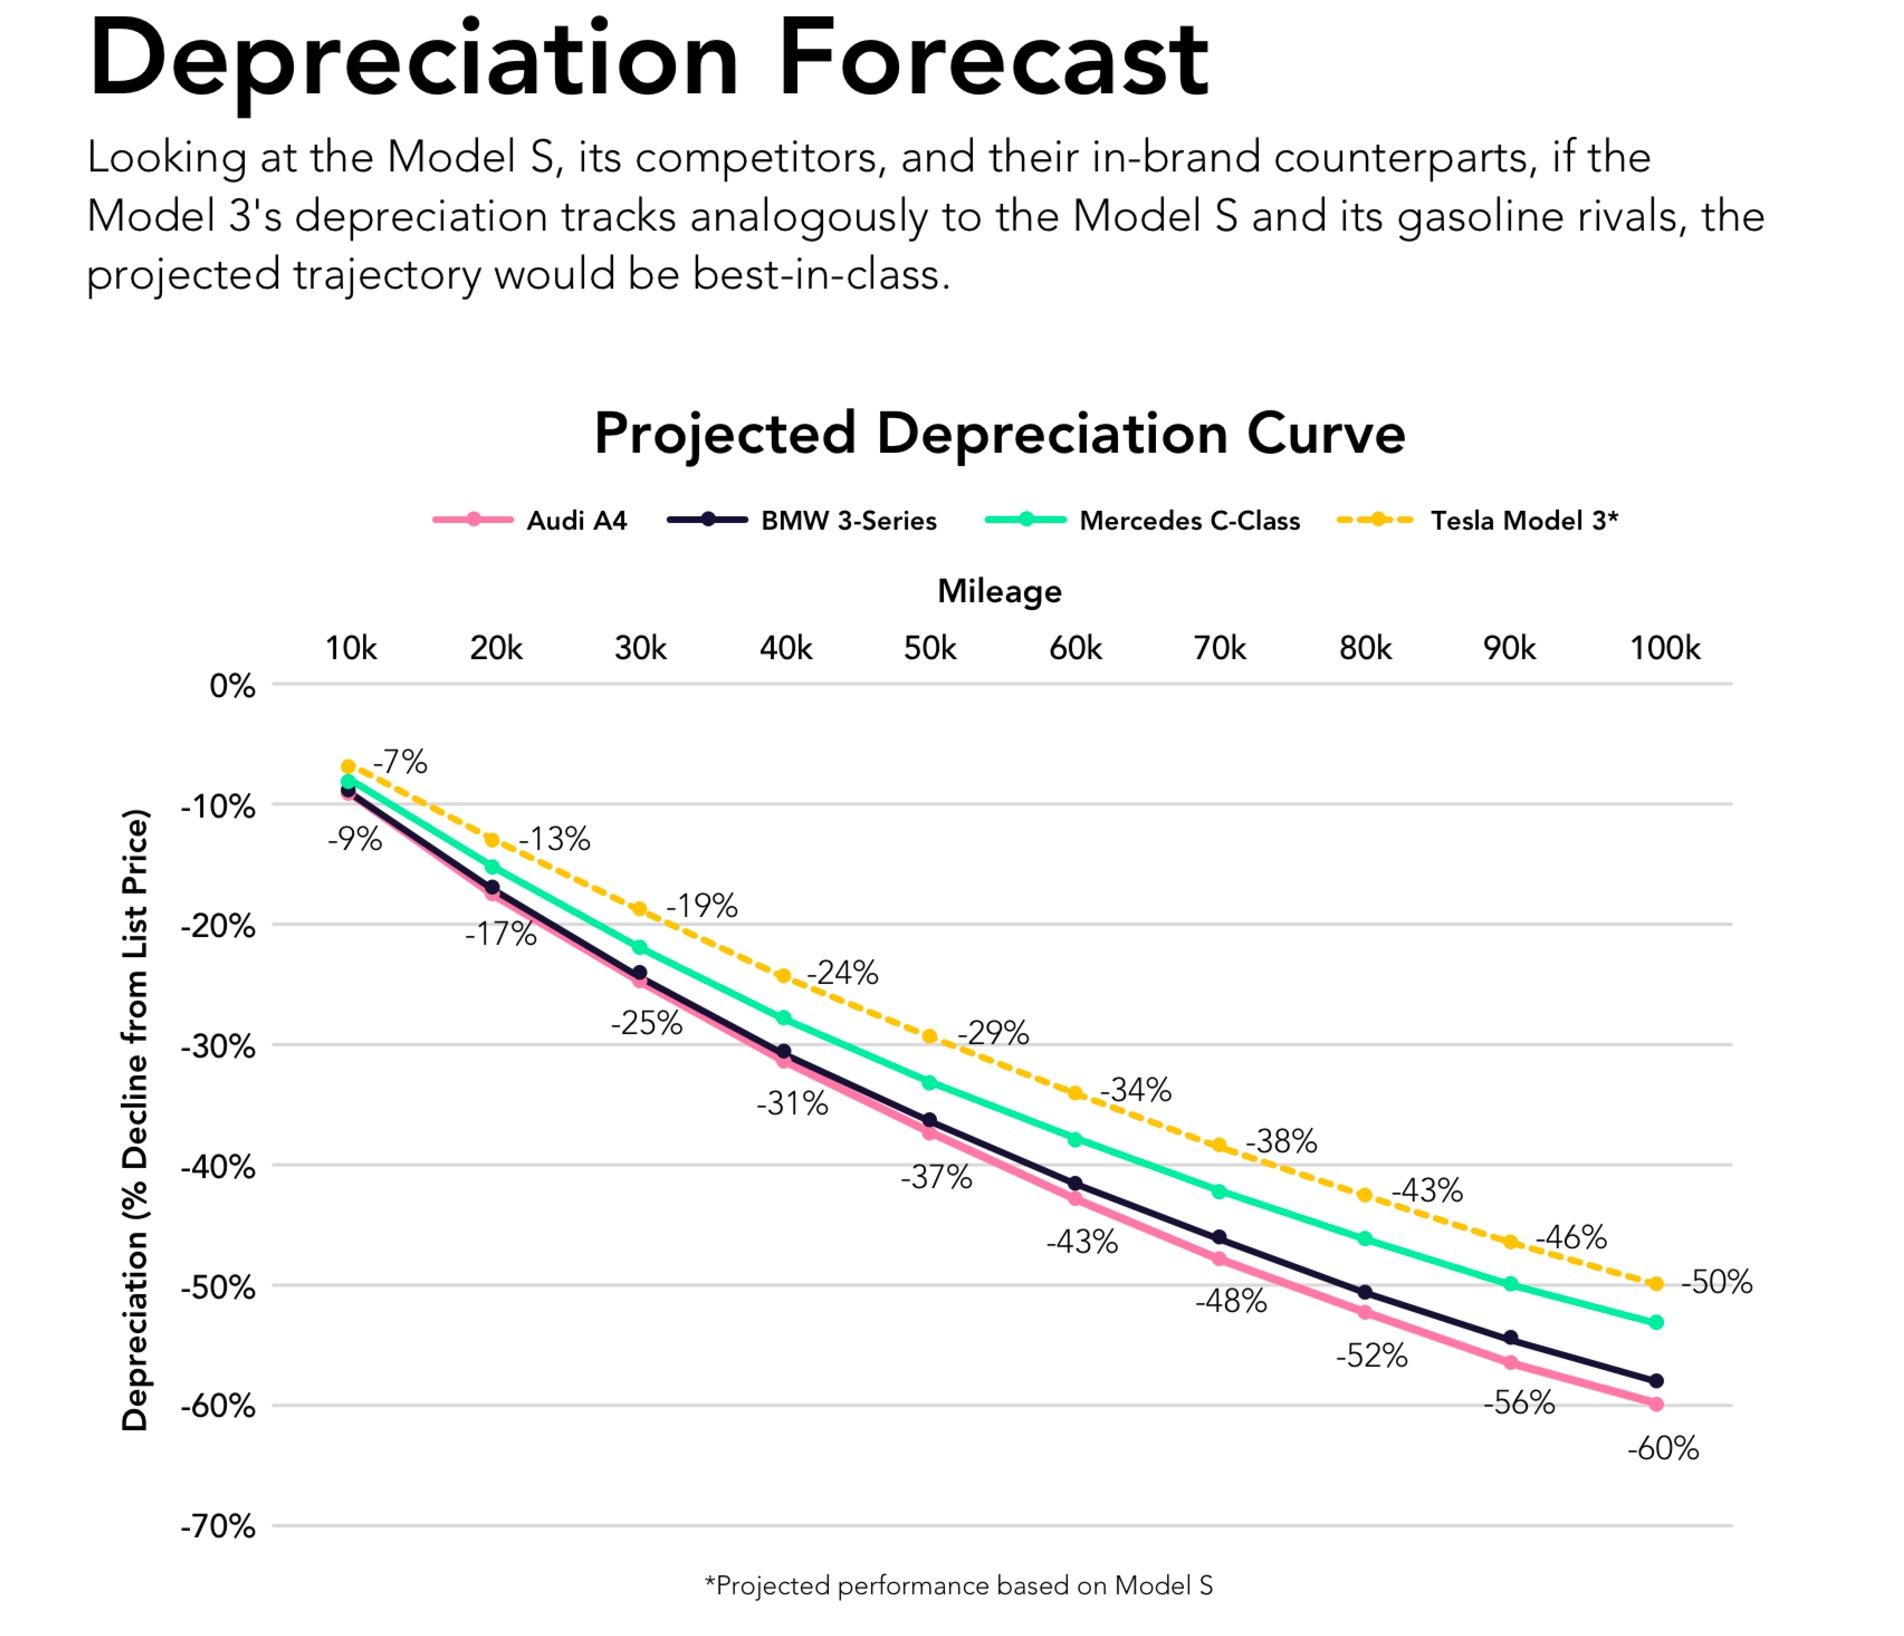 tesla-model-3-depreciation-forecast-autolist-chart